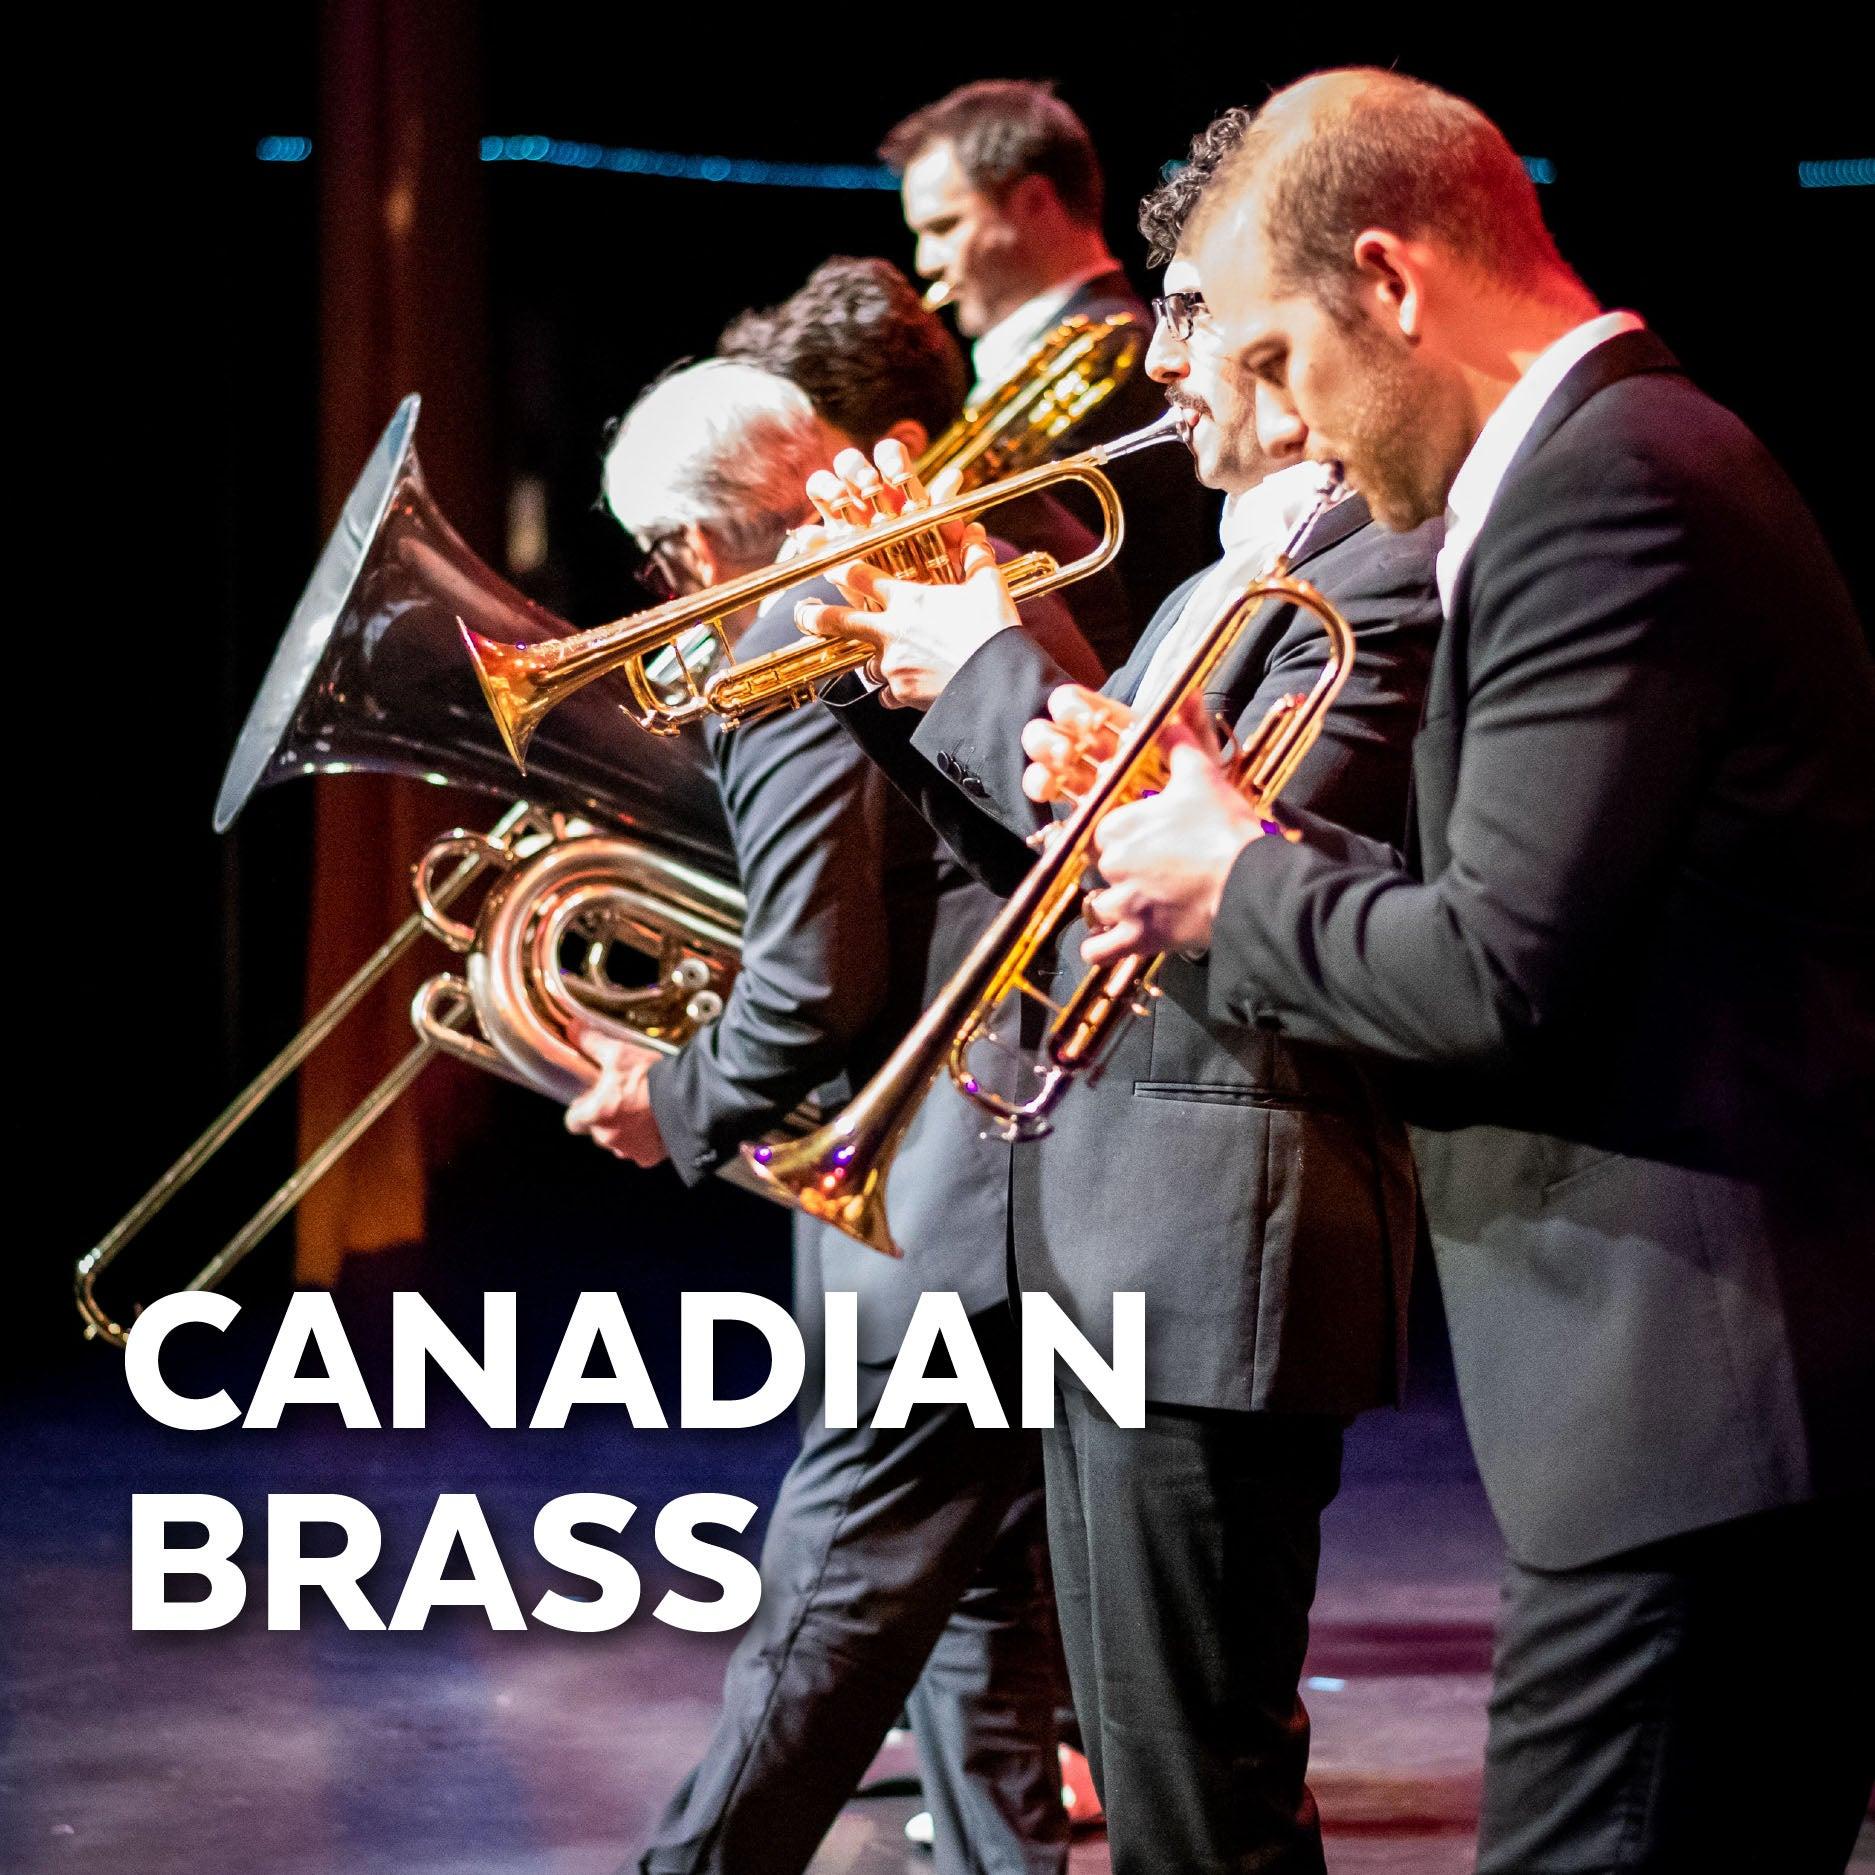 CanadianBrass-01.jpg